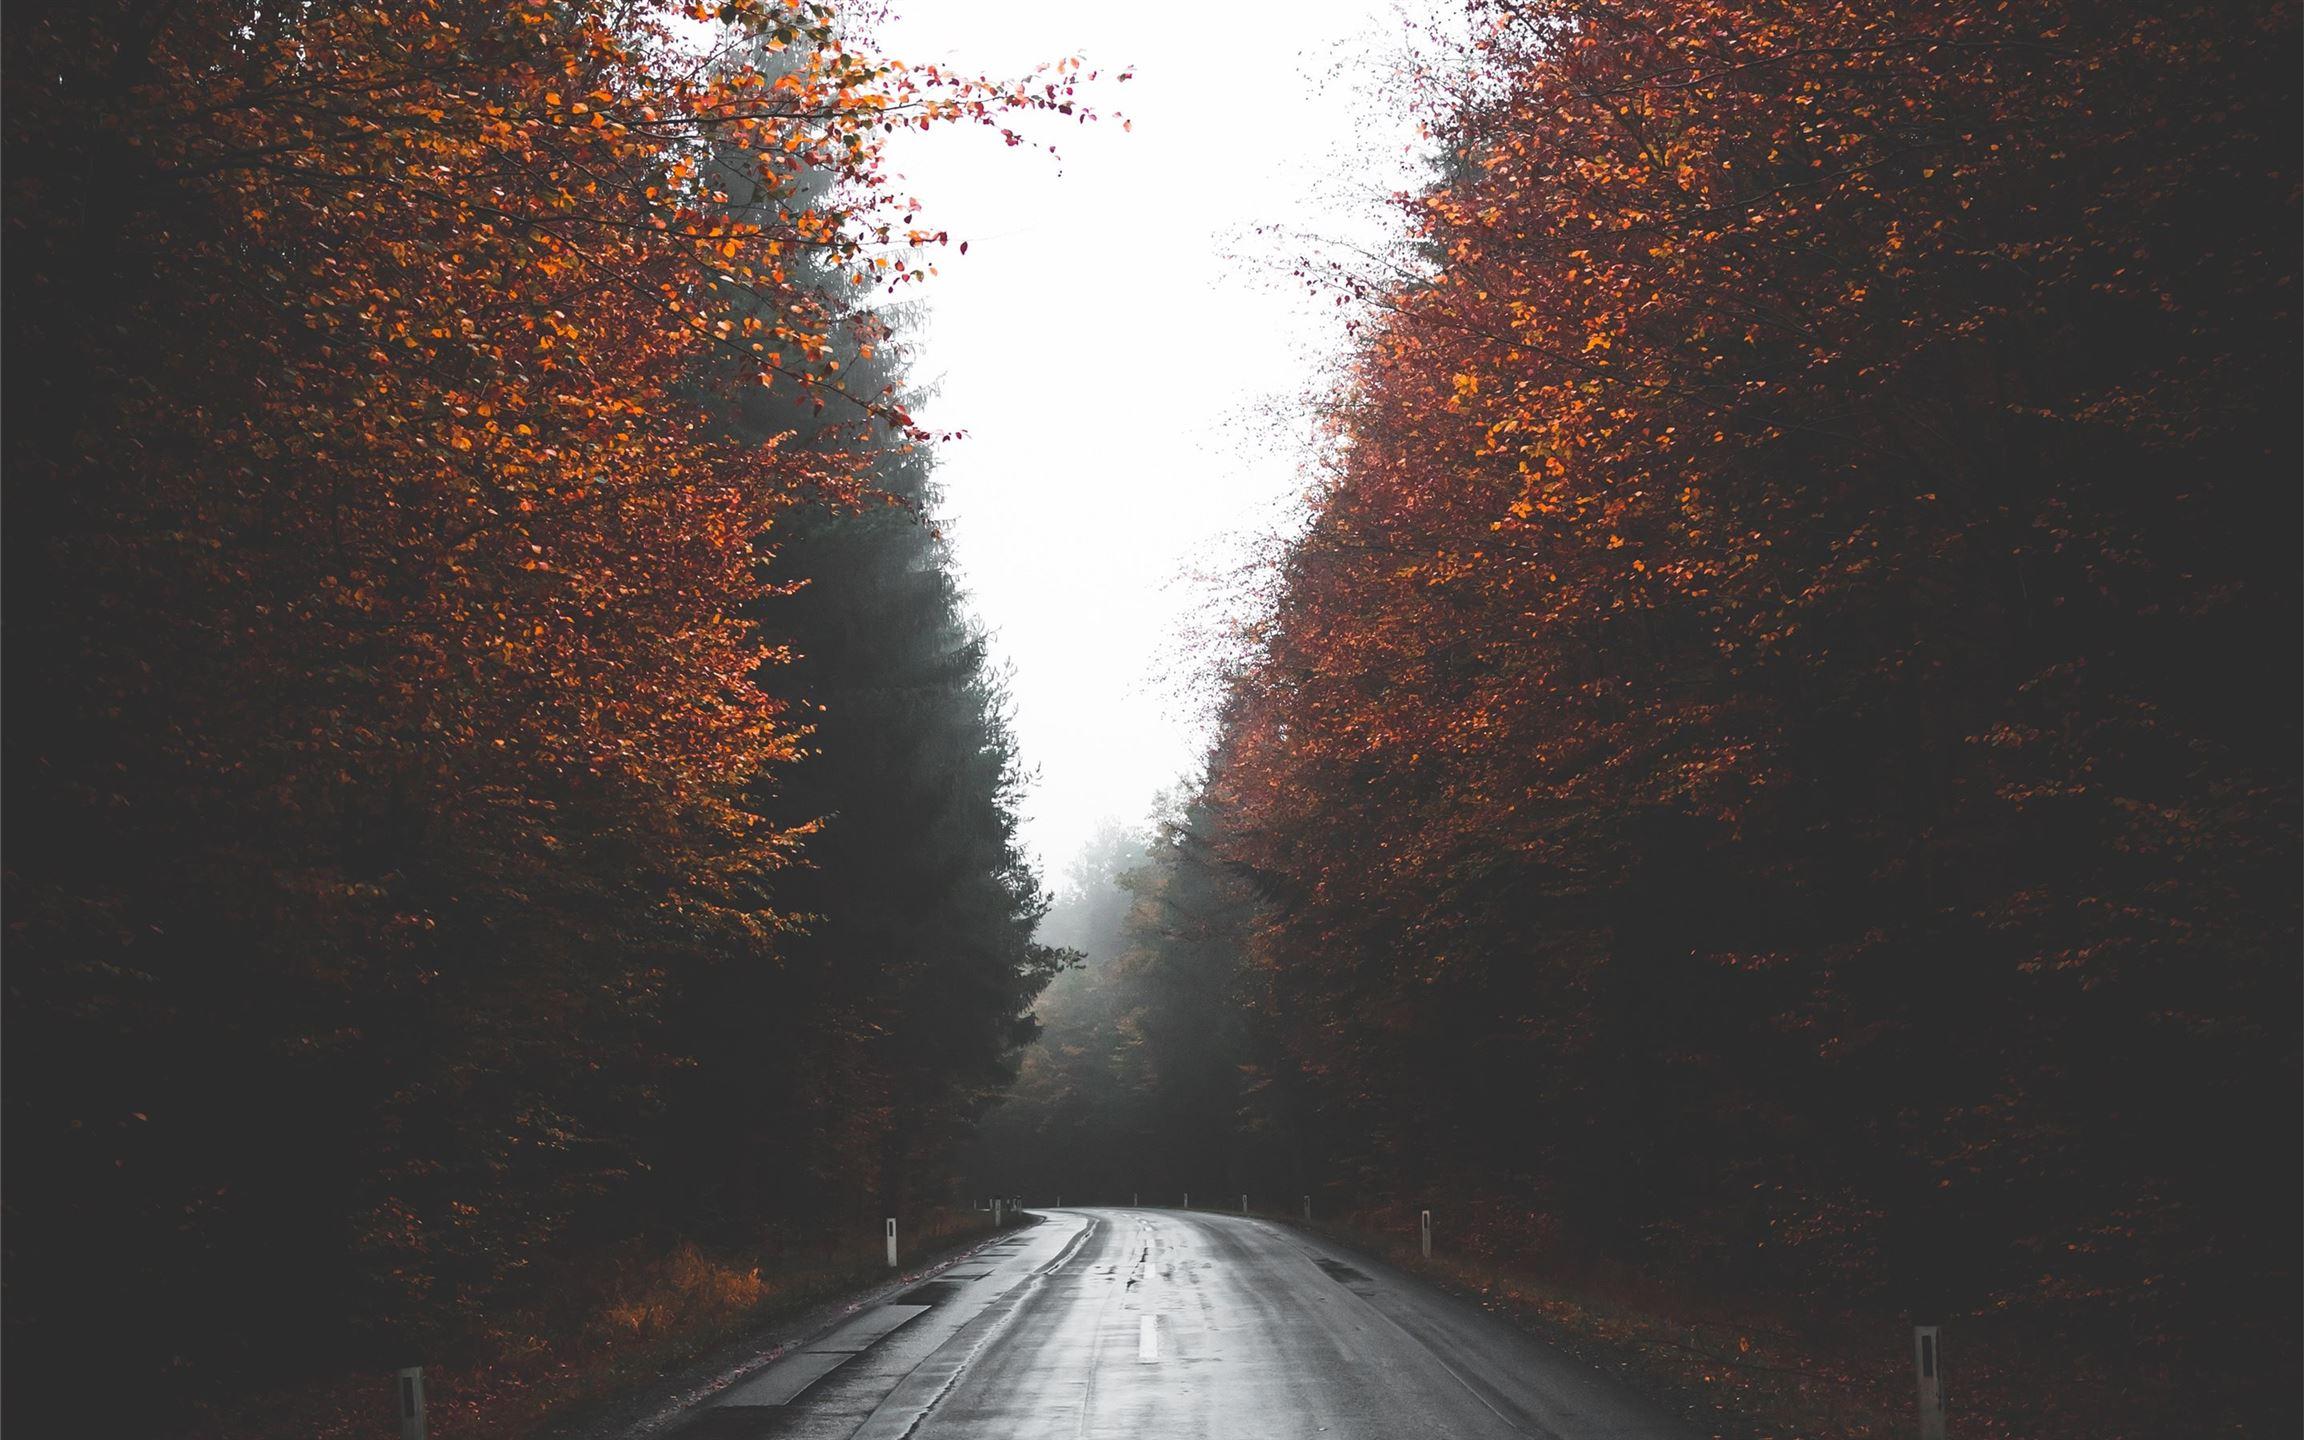 Autumn street in Austria Mac Wallpaper Download | Free Mac ...